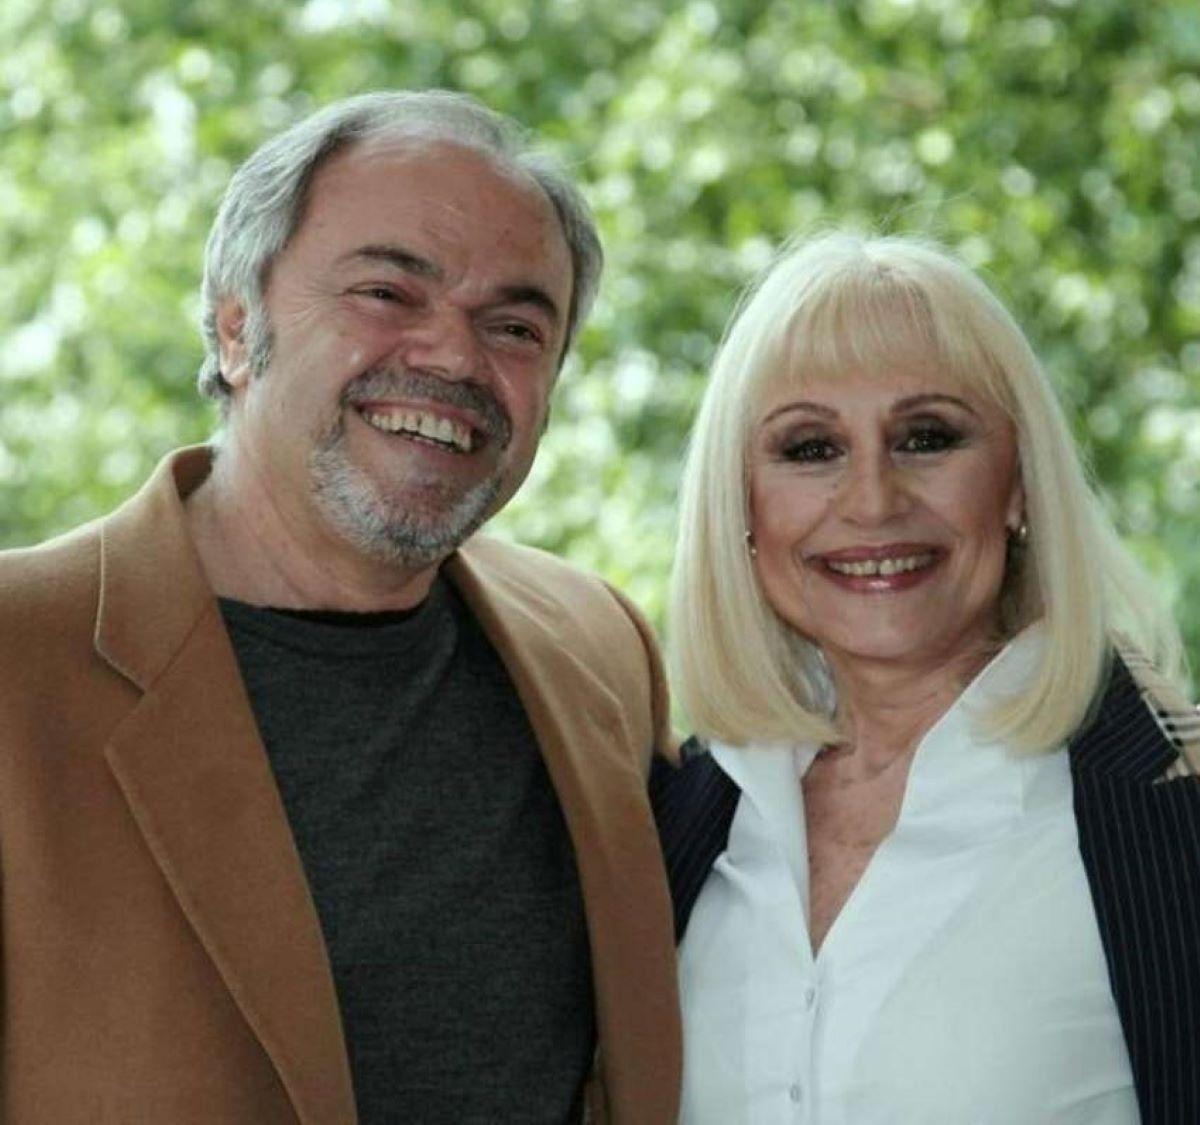 Raffaella Carrà Accuse Satanismo